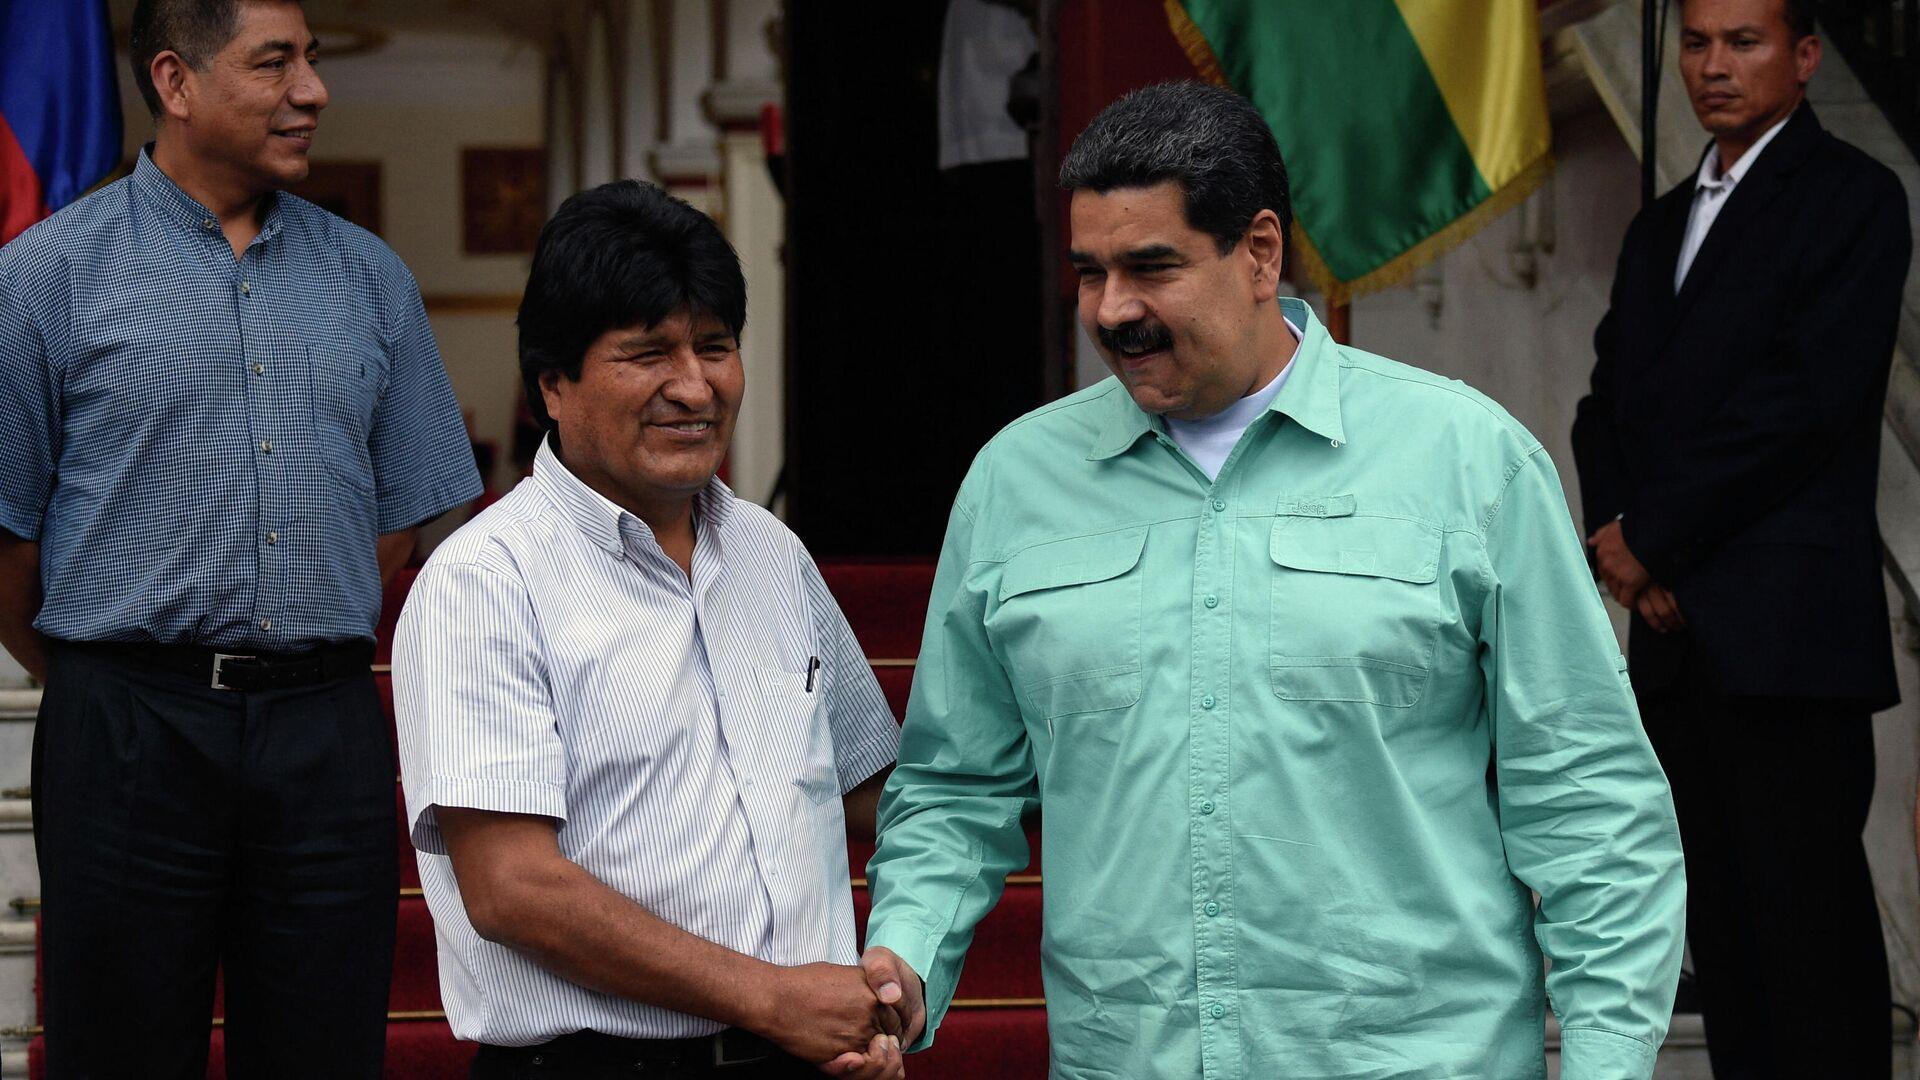 El presidente de Venezuela, Nicolás Maduro, junto al exmandatario de Bolivia, Evo Morales - Sputnik Mundo, 1920, 11.09.2021